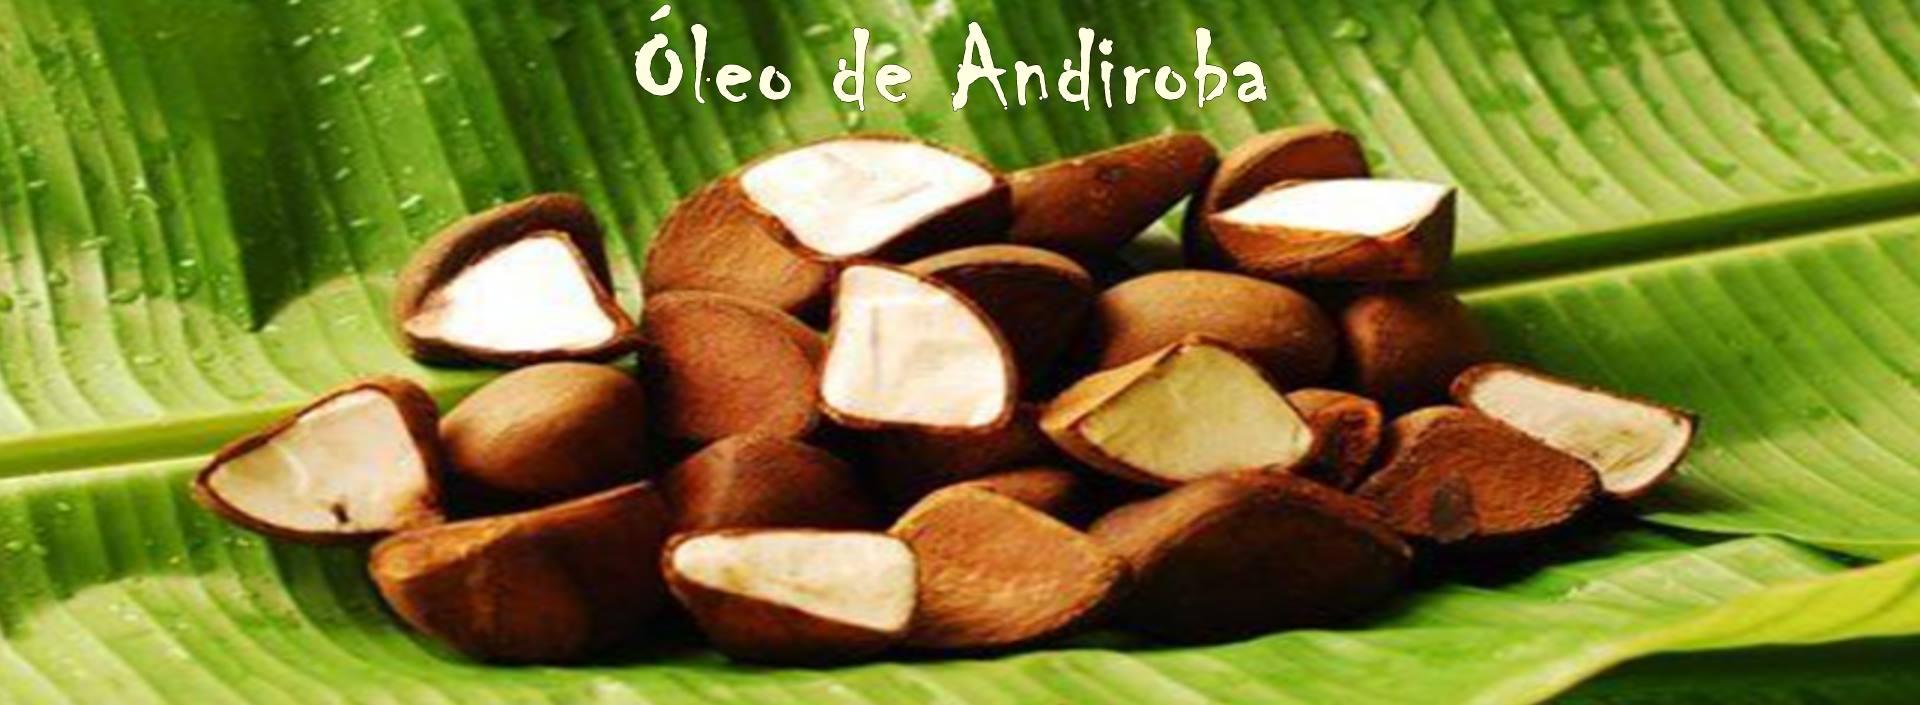 ÓLEO DE ANDIROBA